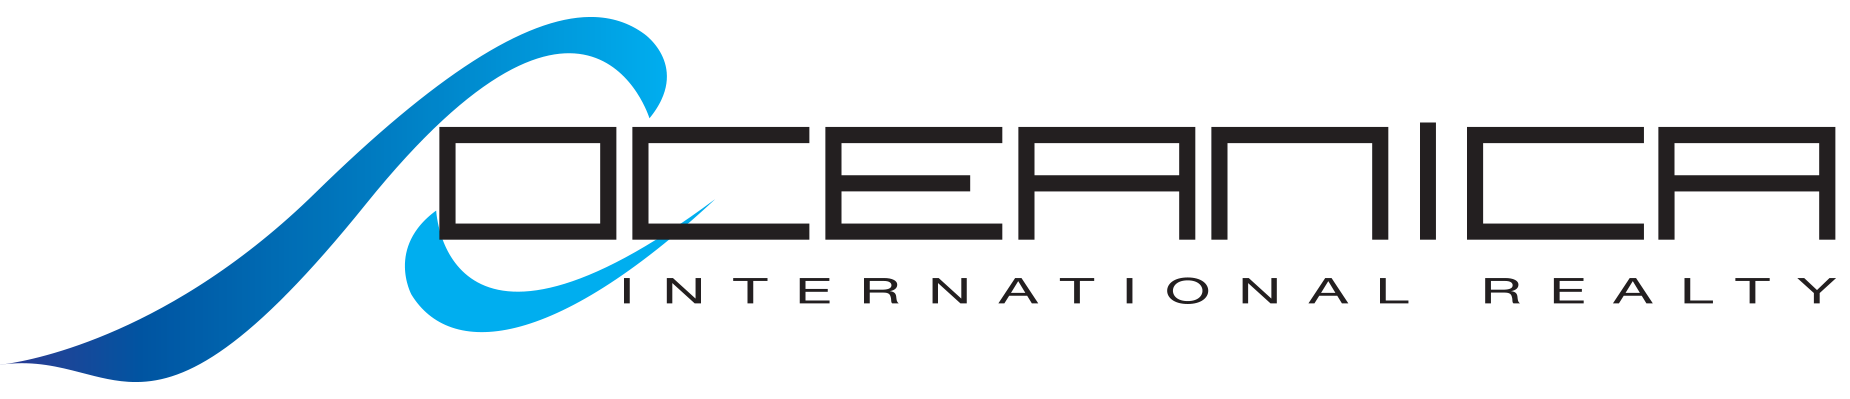 Oceanica International Realty